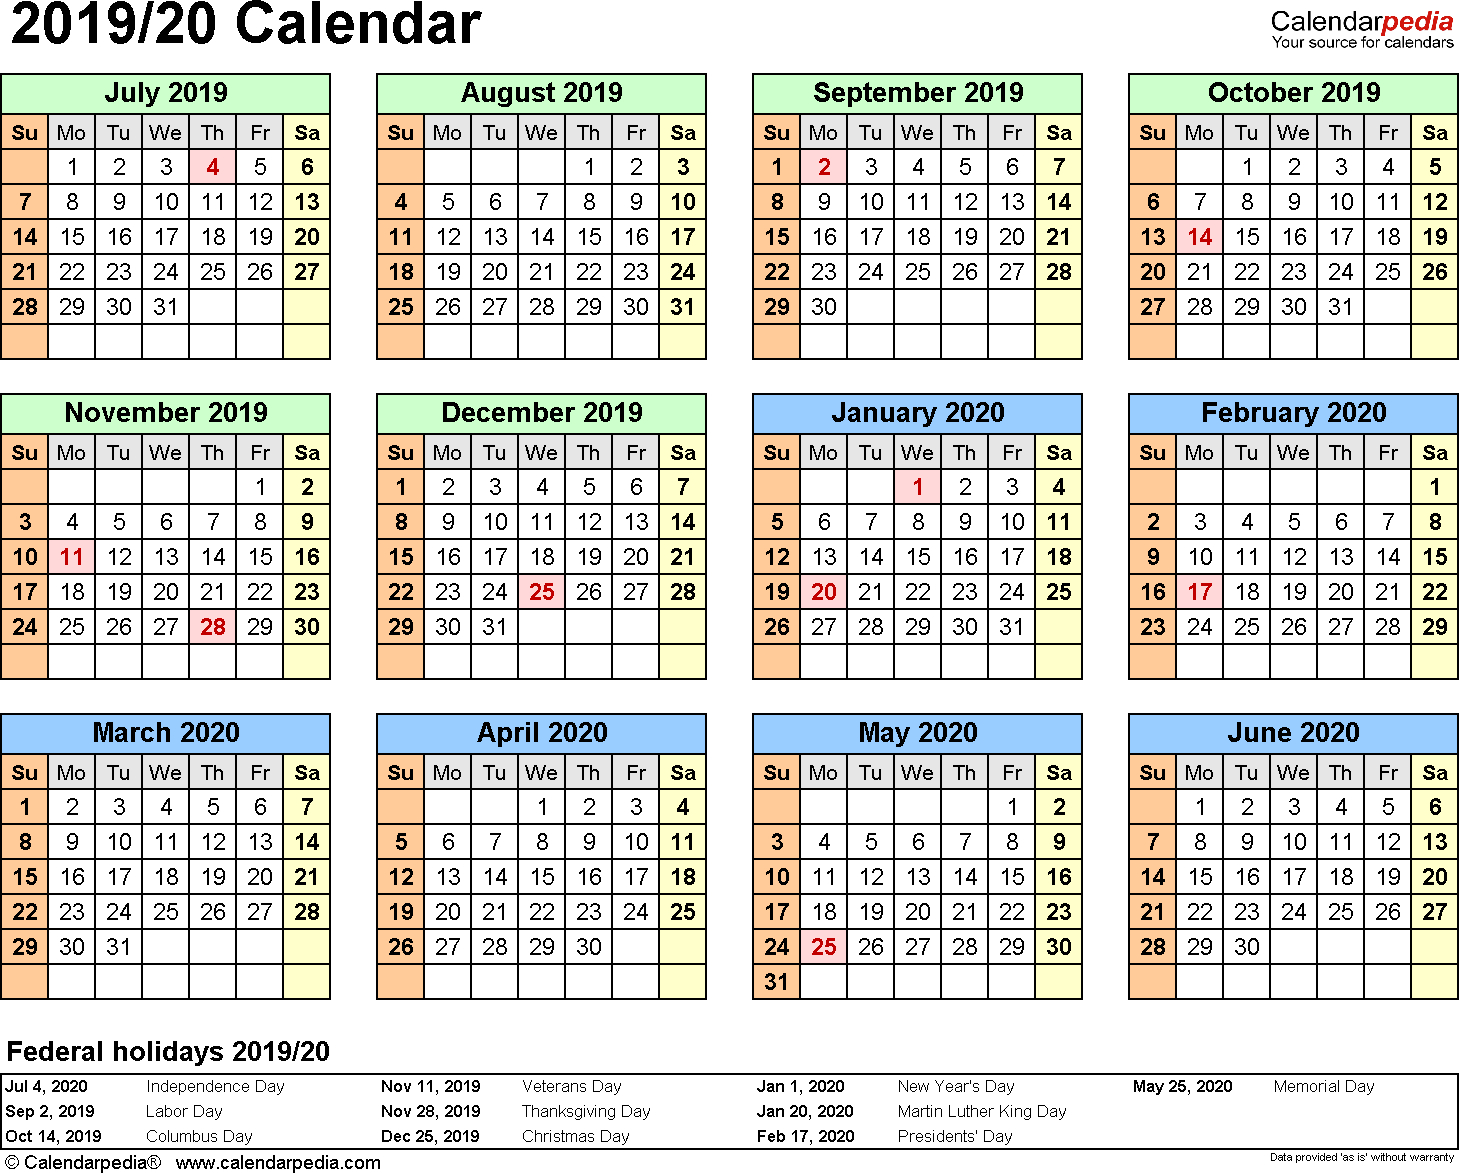 Split Year Calendar 2019/20 (July To June) - Word Templates inside 2019-2020 Blank Calendar To Print